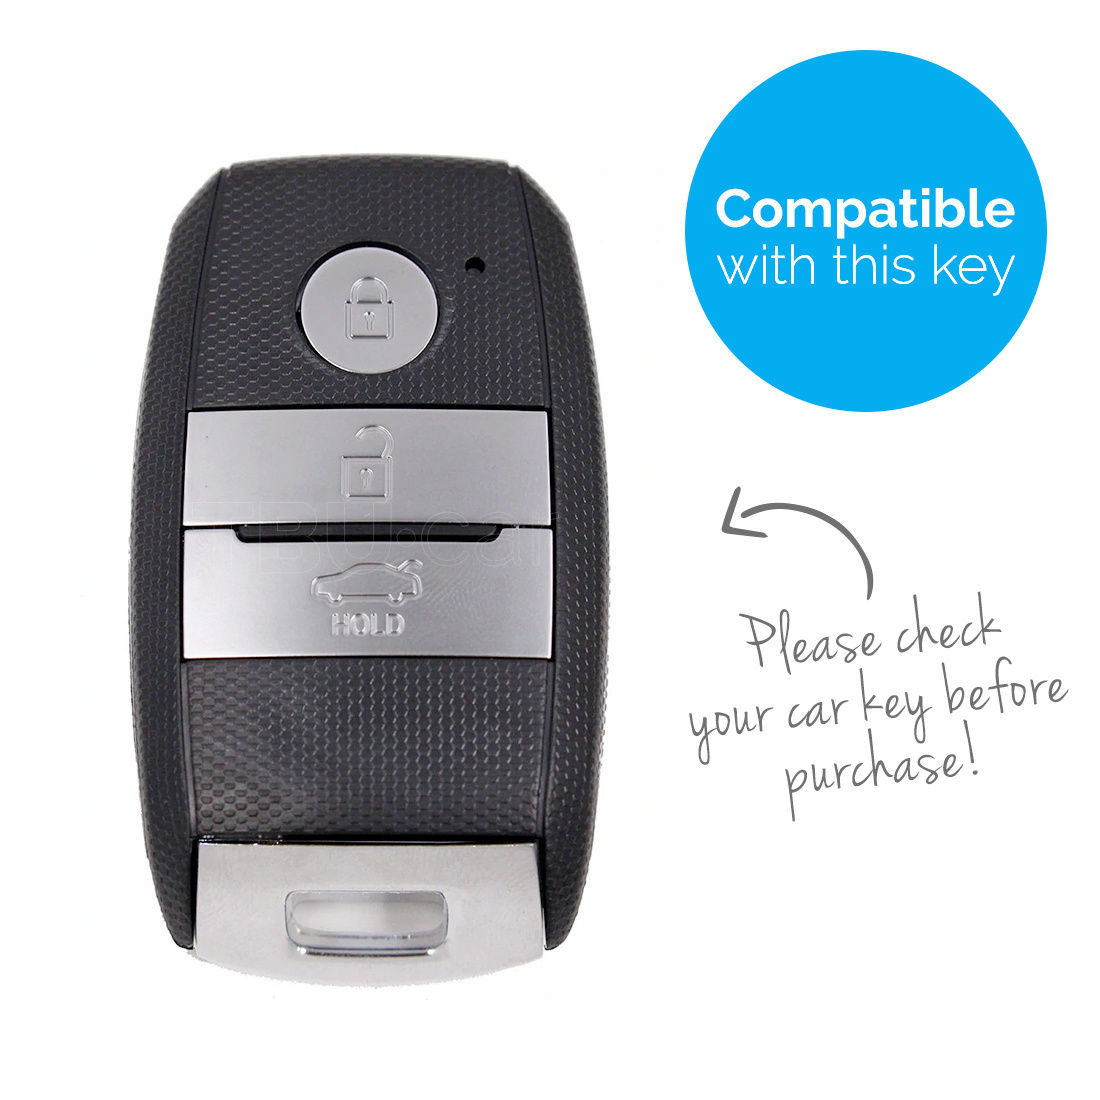 TBU car TBU car Sleutel cover compatibel met Kia - TPU sleutel hoesje / beschermhoesje autosleutel - Chrome